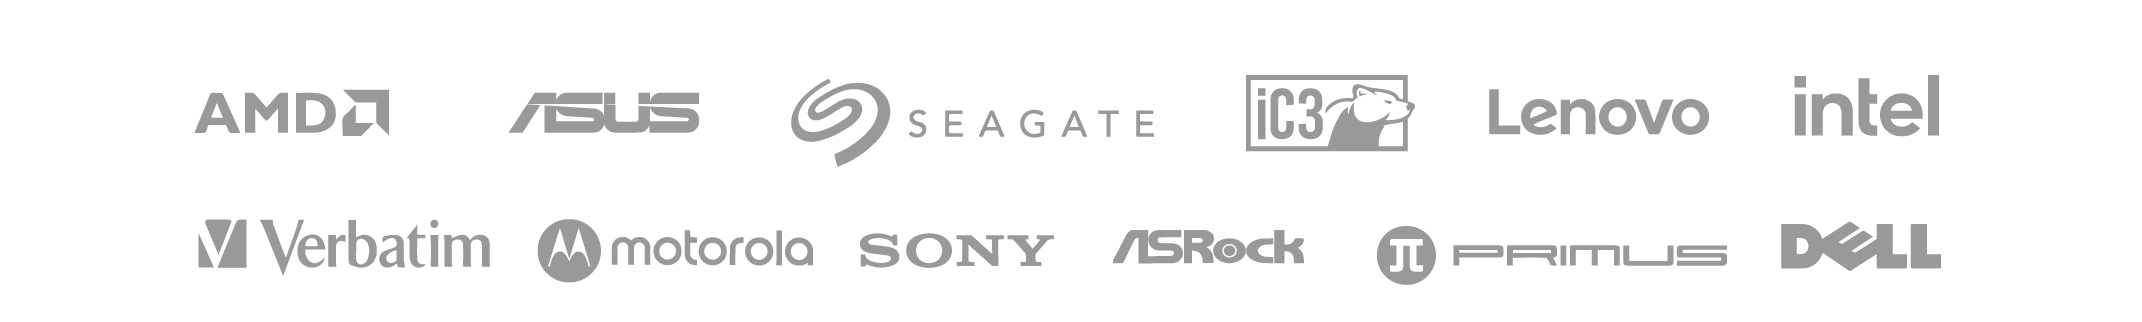 BANNERS WEB FIXON - 2-14